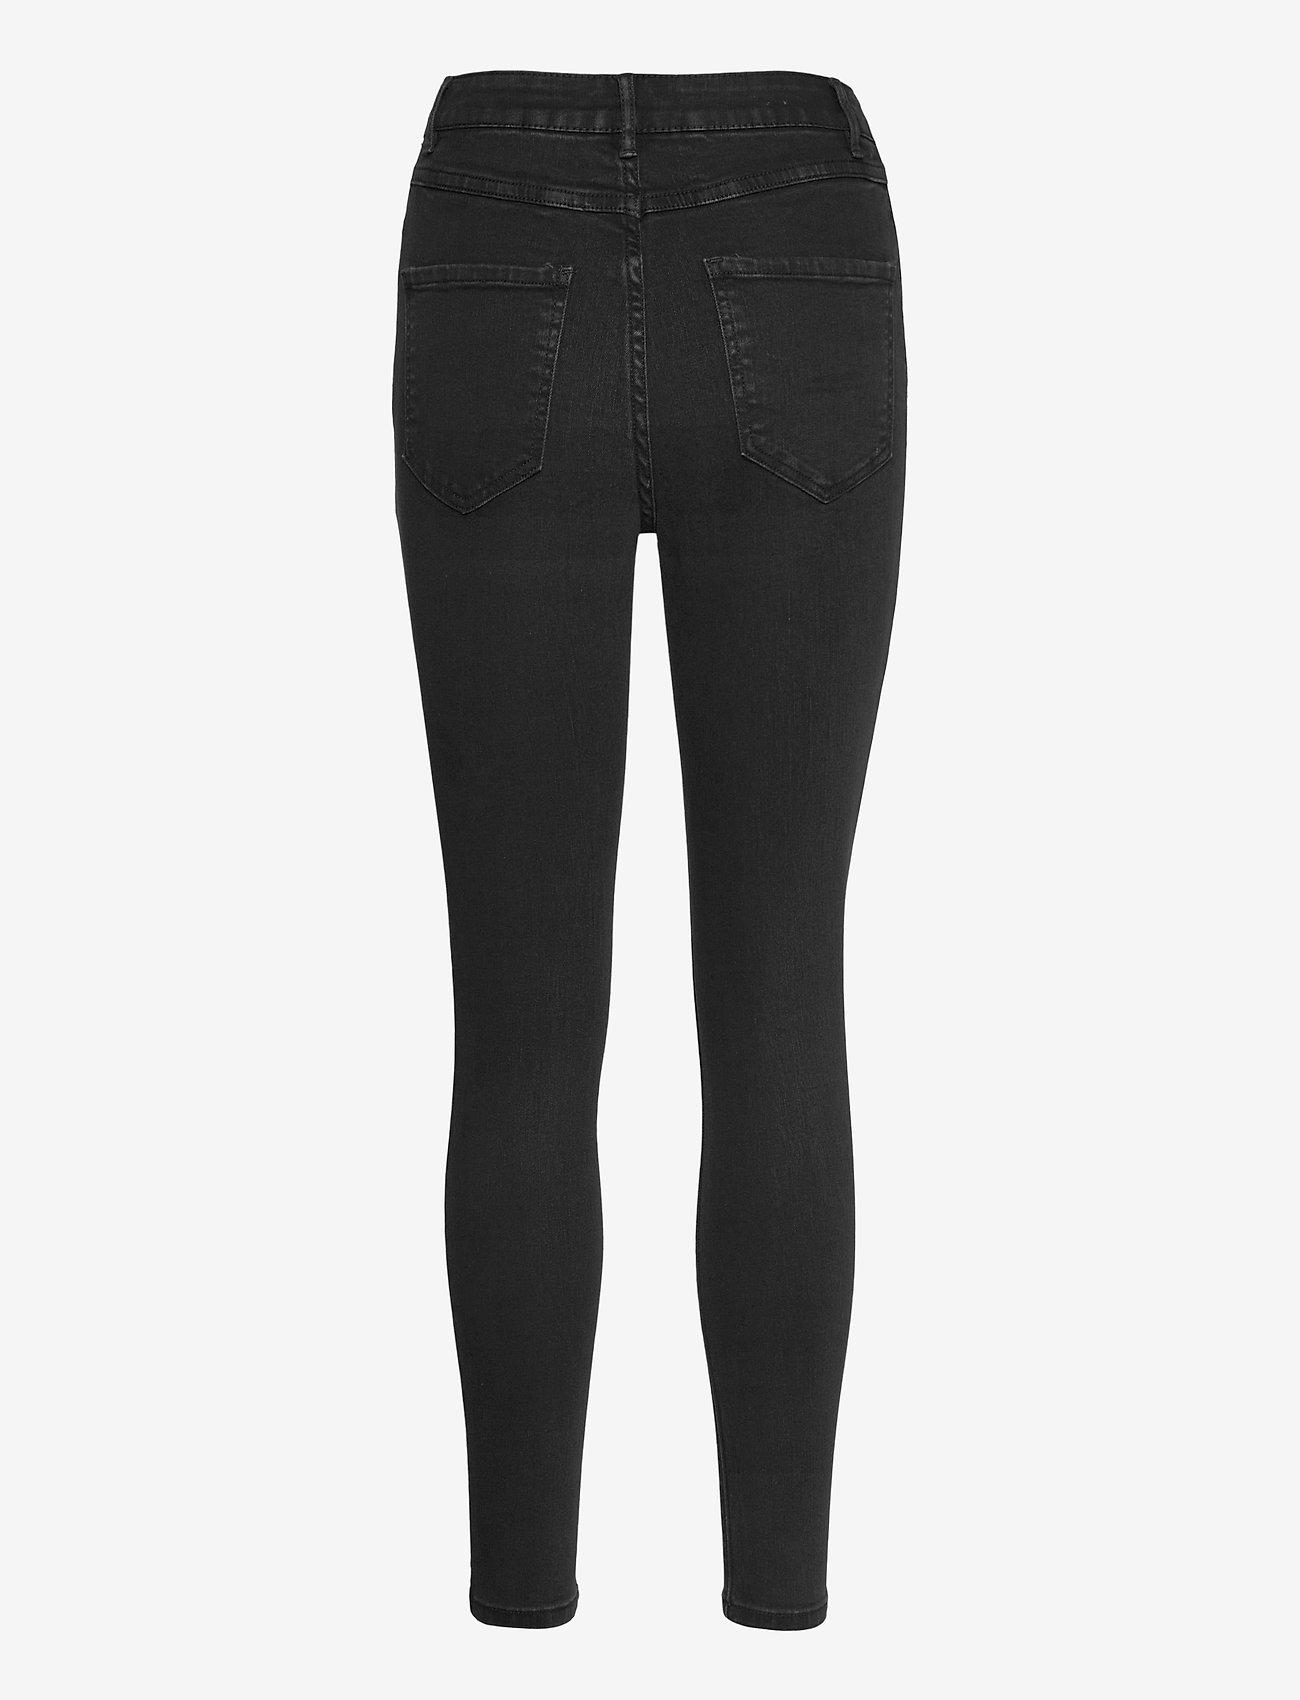 Vila - VIEKKO HWSK 7/8 JEANS/SU - - skinny jeans - black - 1